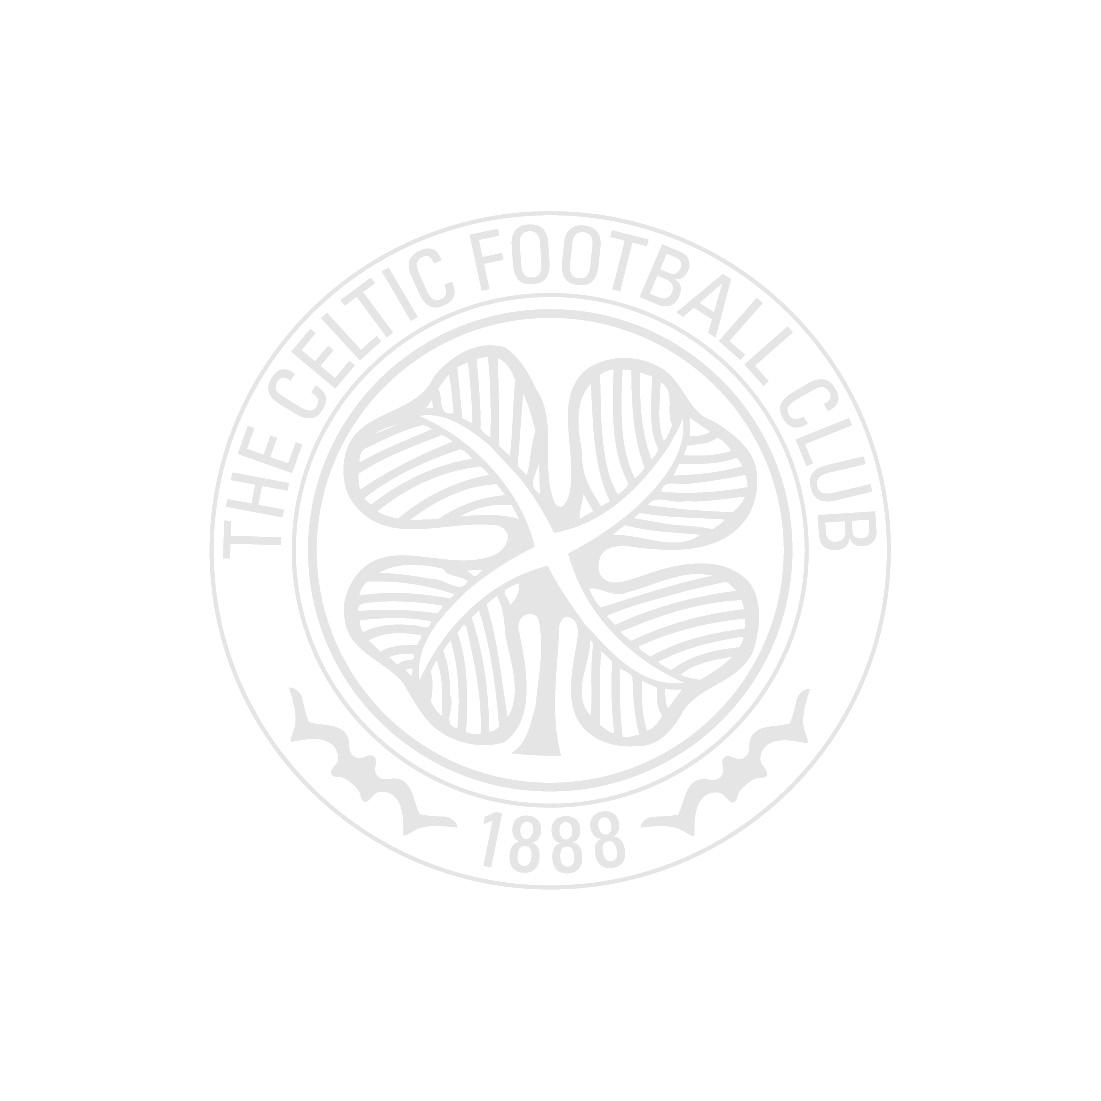 Celtic Stainless Steel Crest Cufflinks